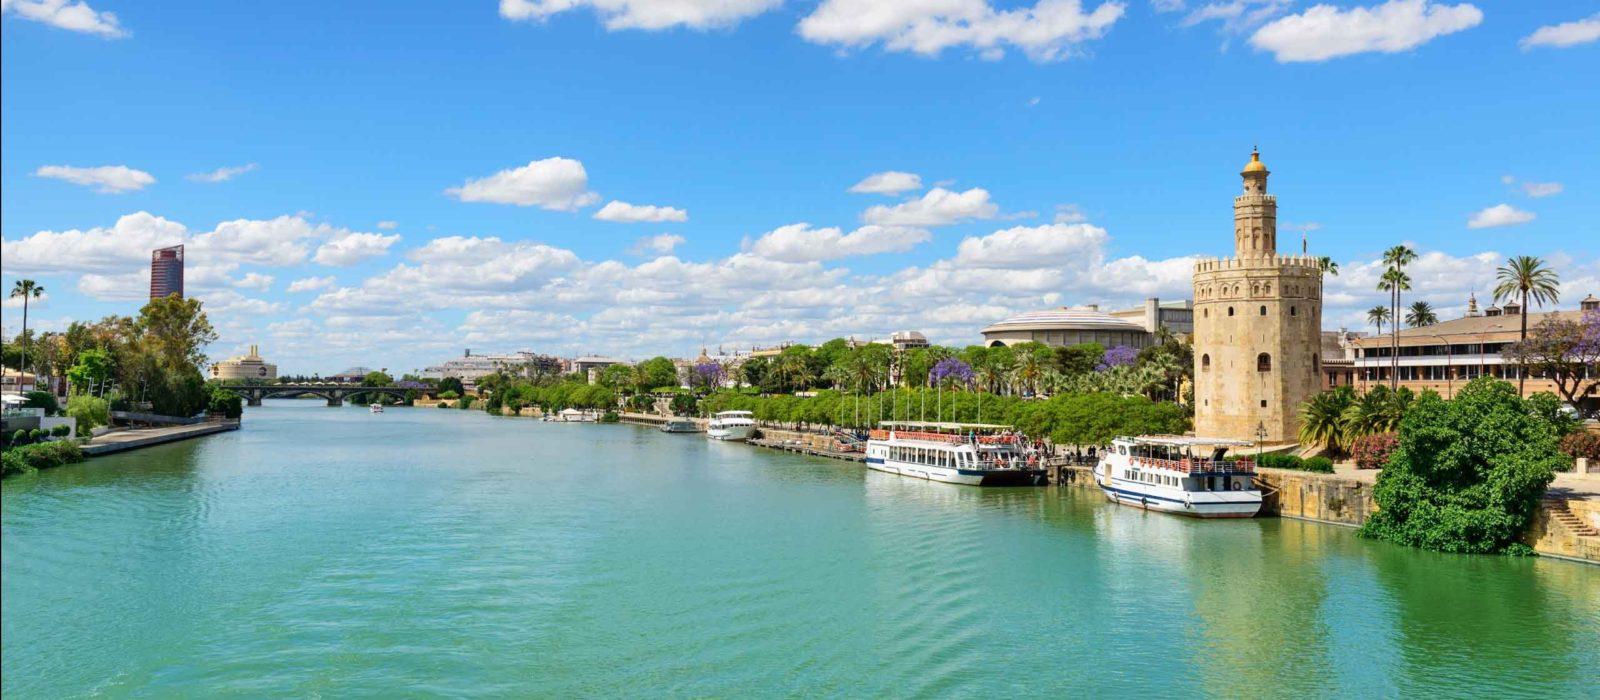 guadalquivir-river-golden-tower-seville